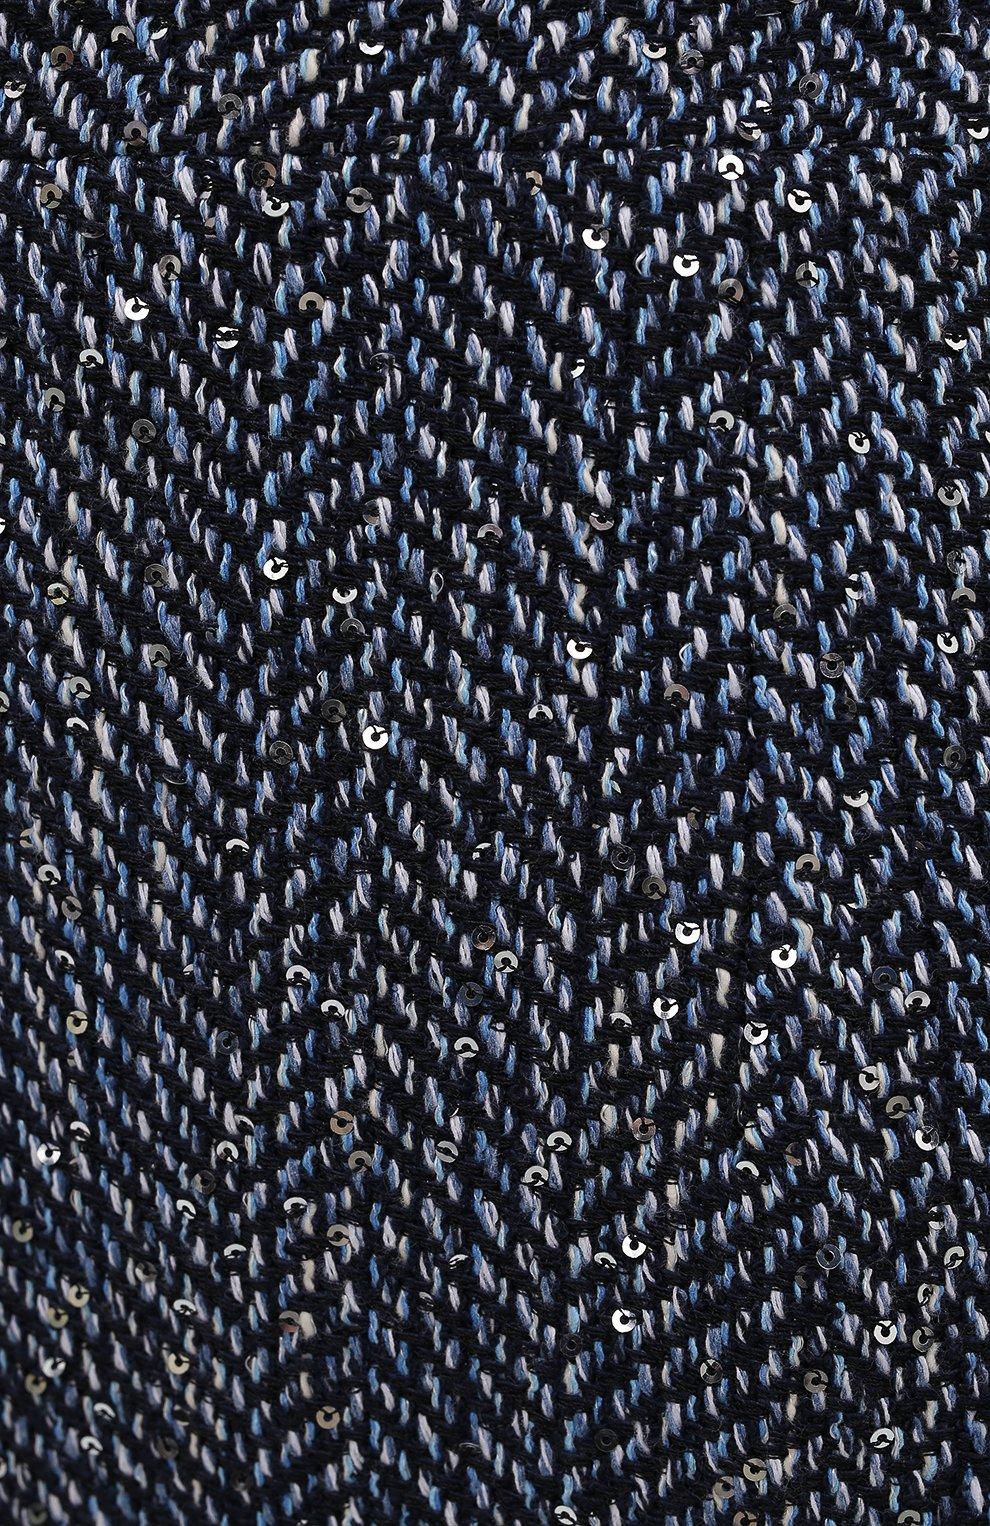 Женская юбка ALESSANDRA RICH синего цвета, арт. FAB1441-F3188 | Фото 5